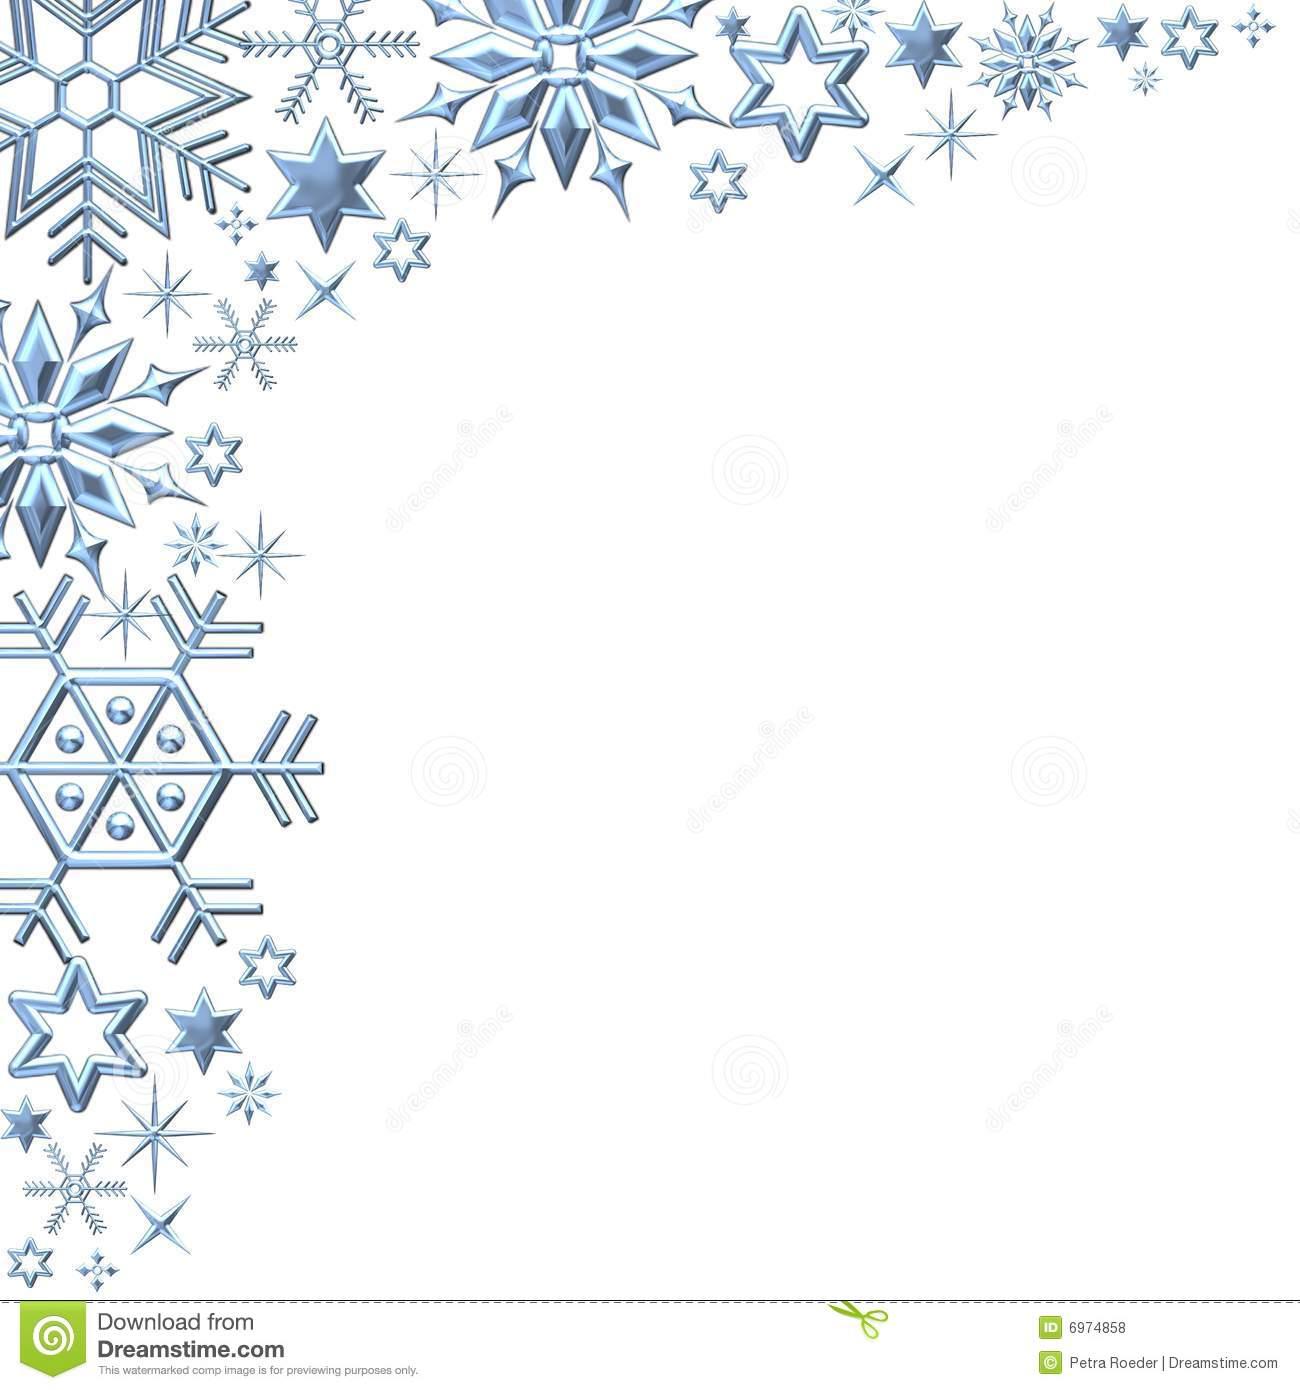 Winter clipart frame Snowflake Border Winter Clipart Printable